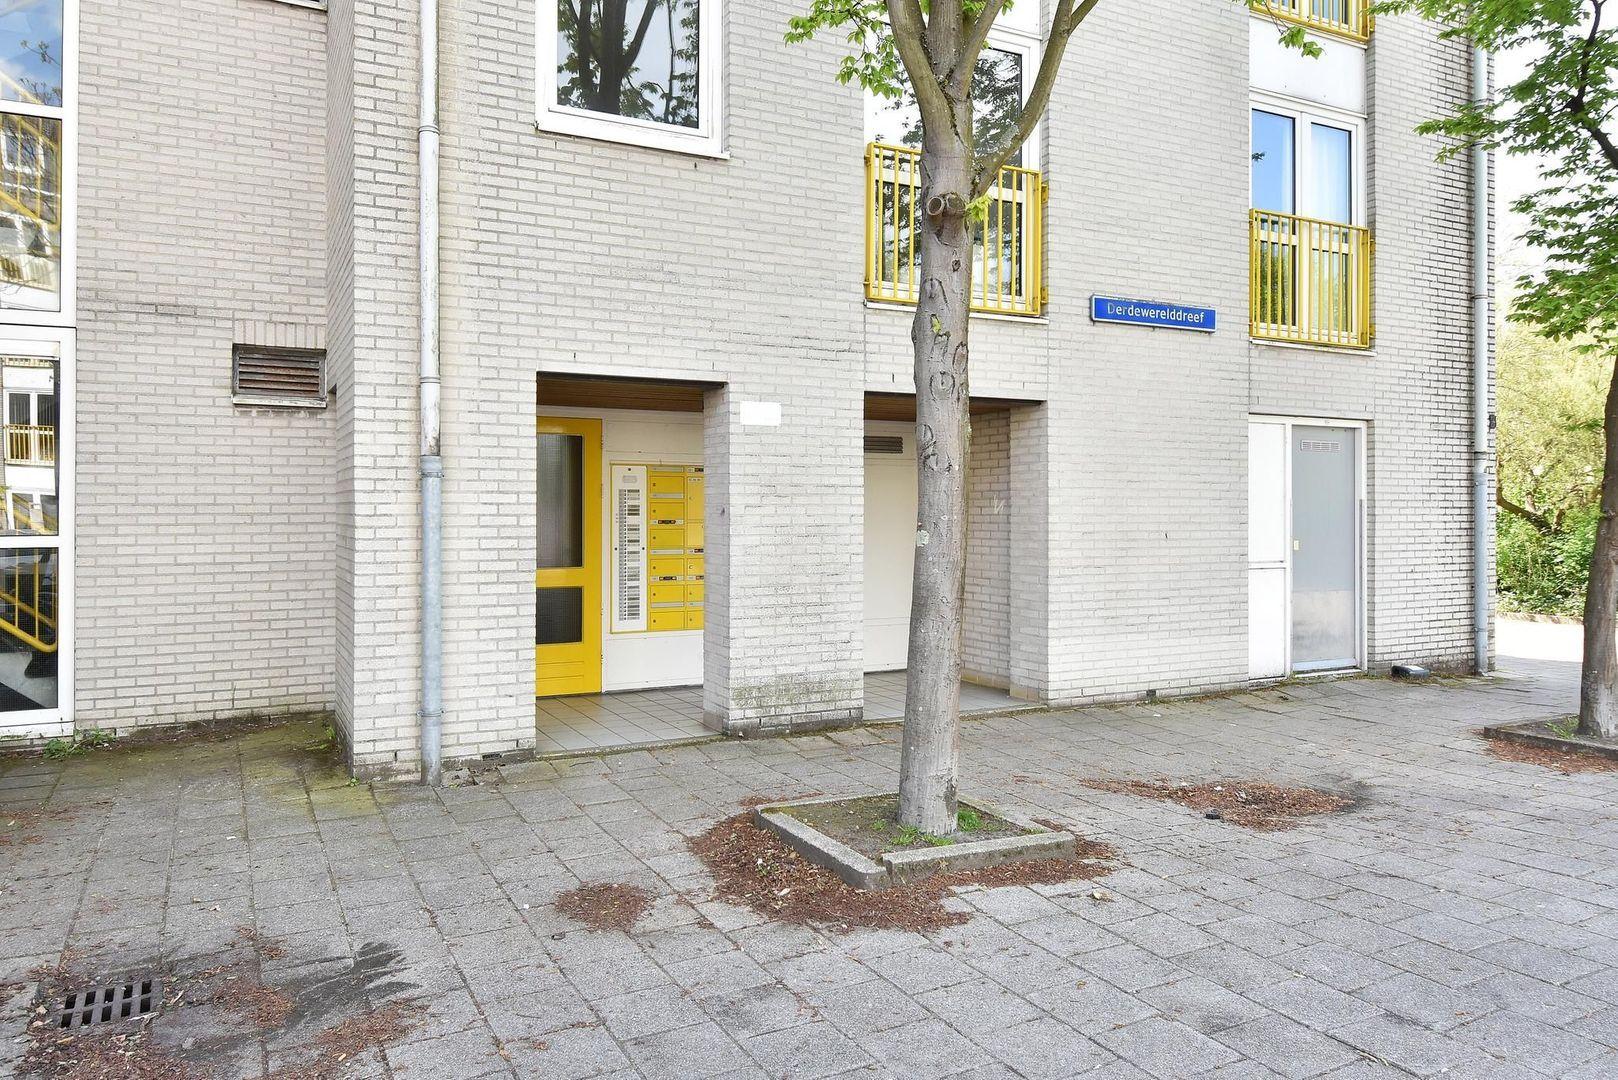 Derde Werelddreef 38, Delft foto-1